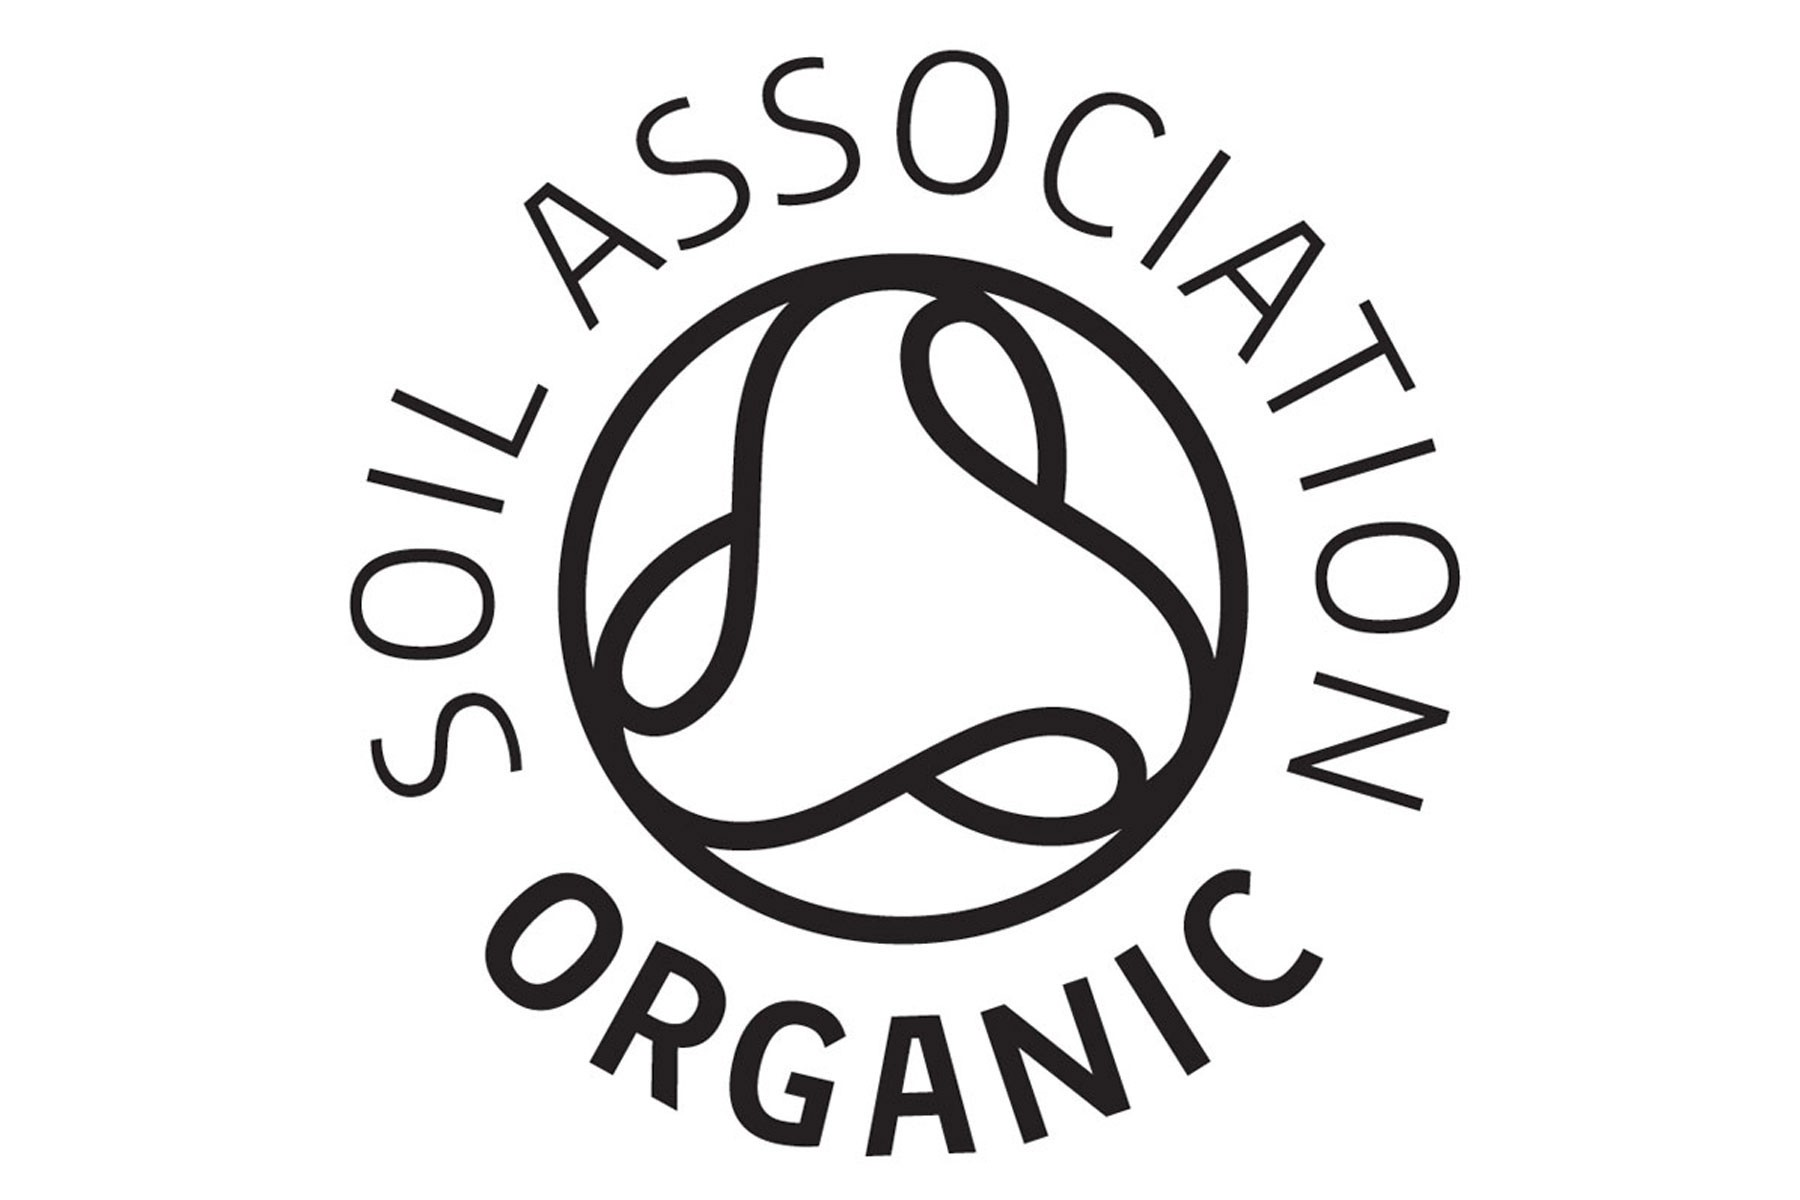 soil-association-organic.jpg